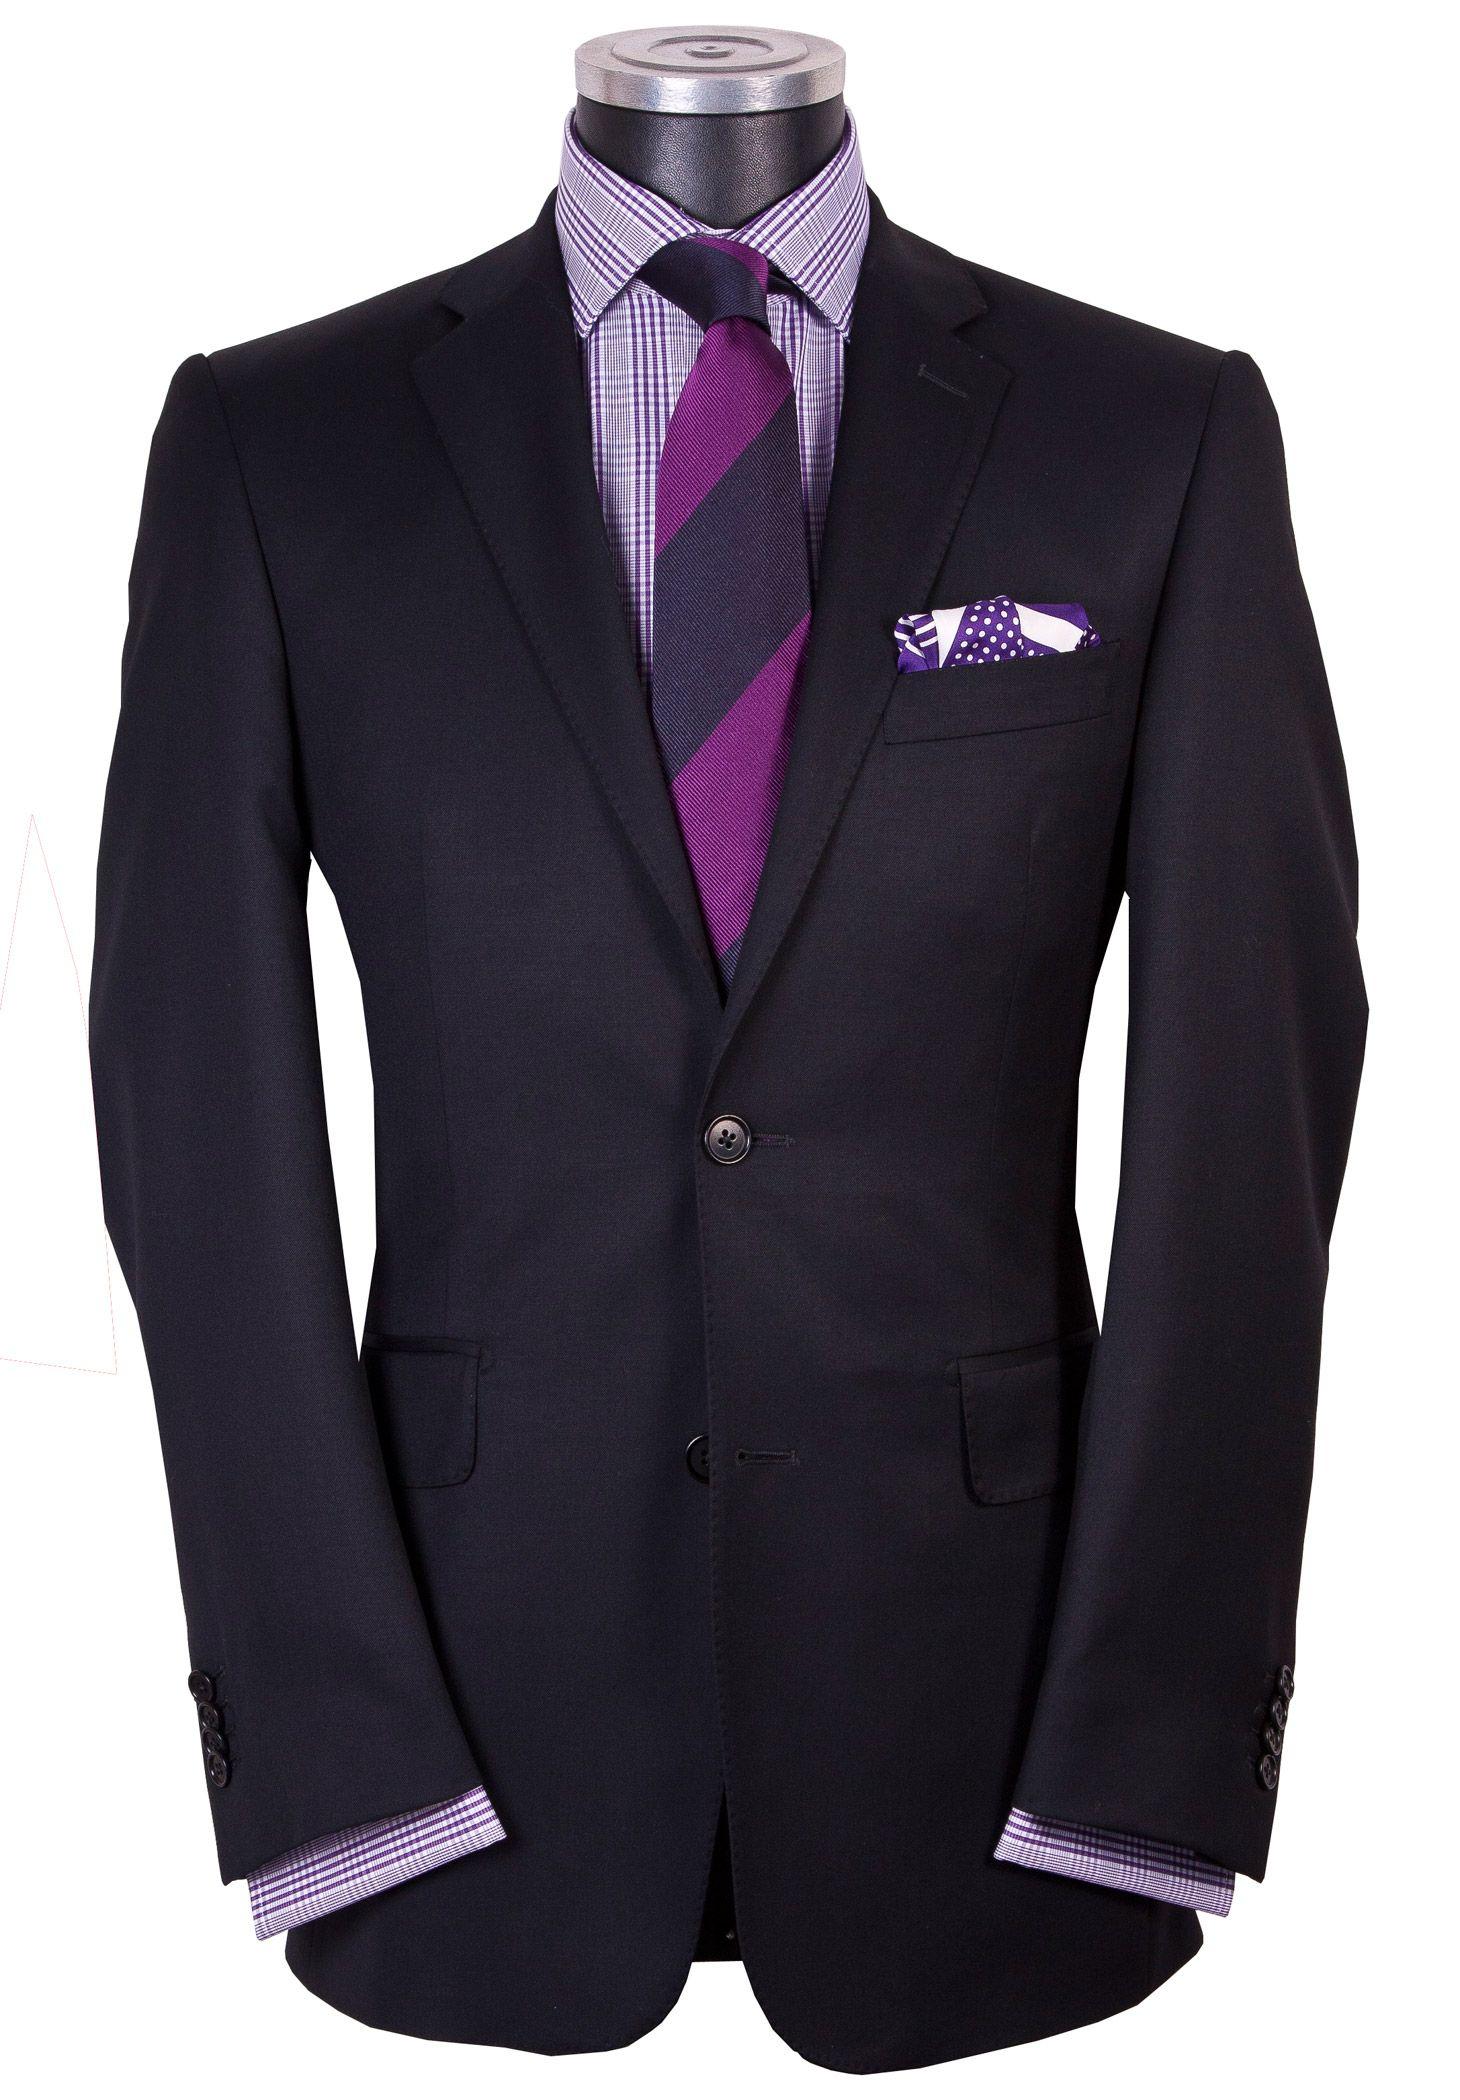 Super 120 s Black Modern Twill slim silhouette suit  0d8f2108eb